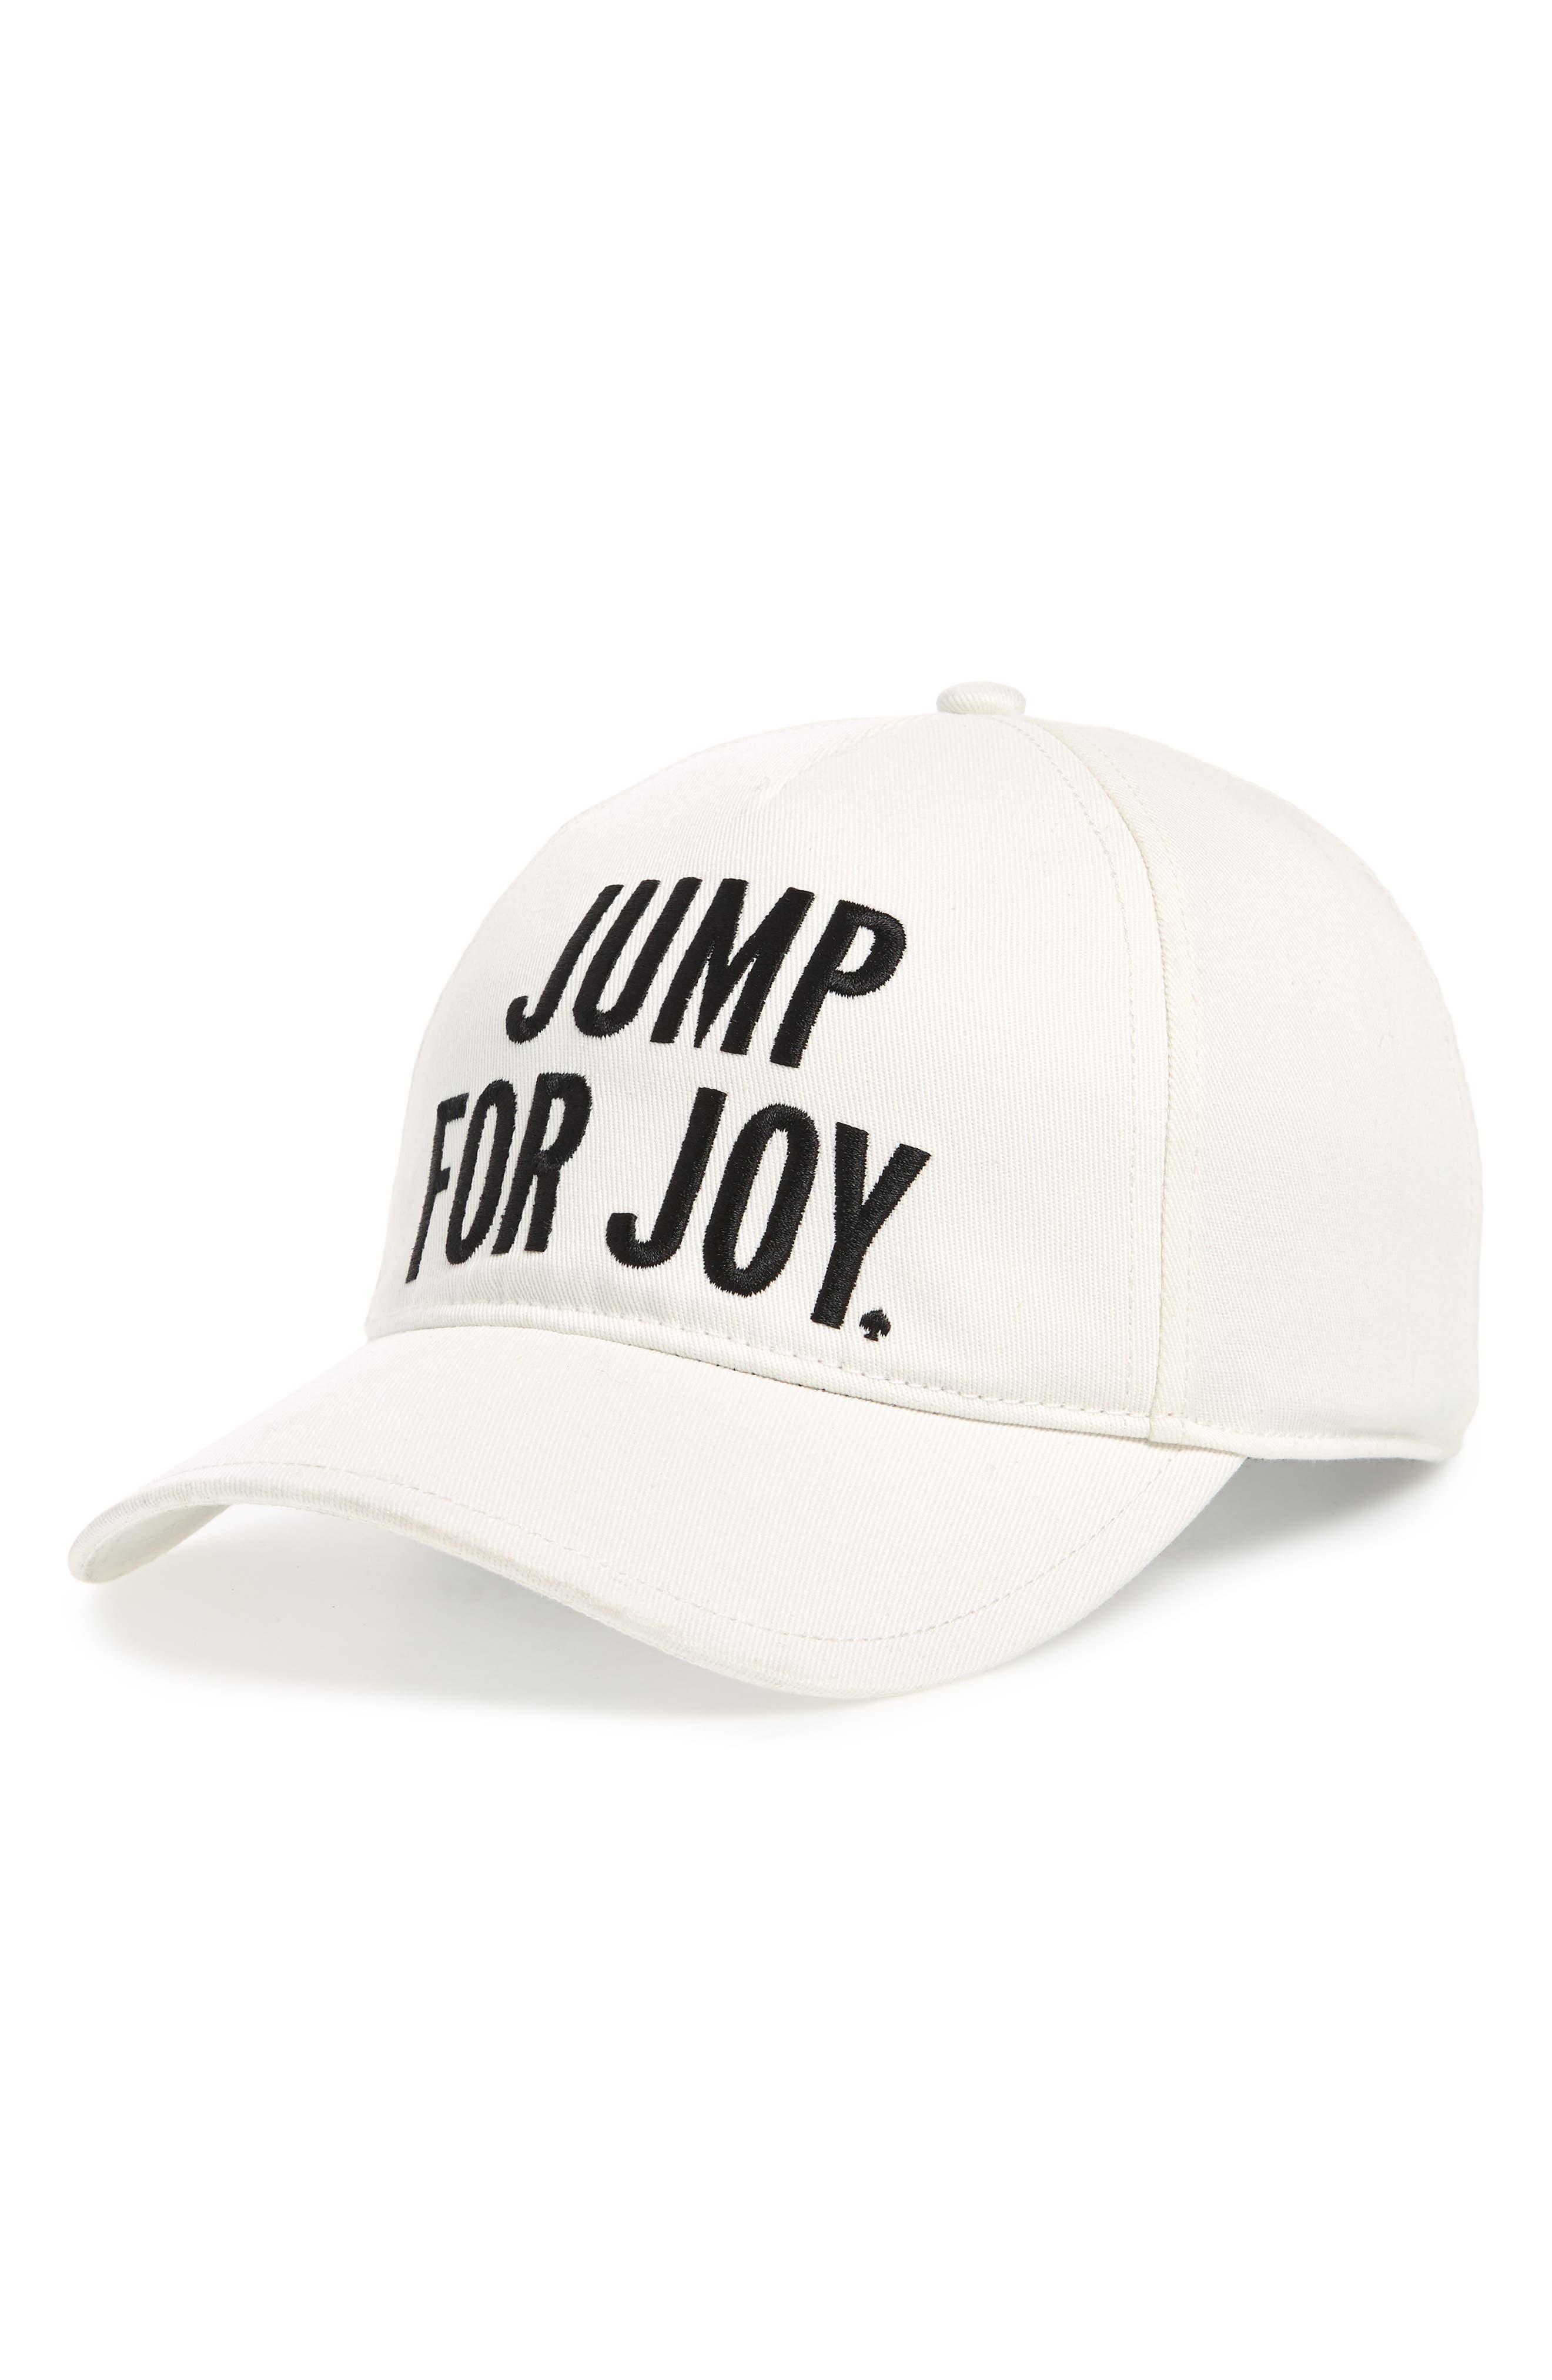 KATE SPADE NEW YORK,                             jump for joy cap,                             Main thumbnail 1, color,                             100